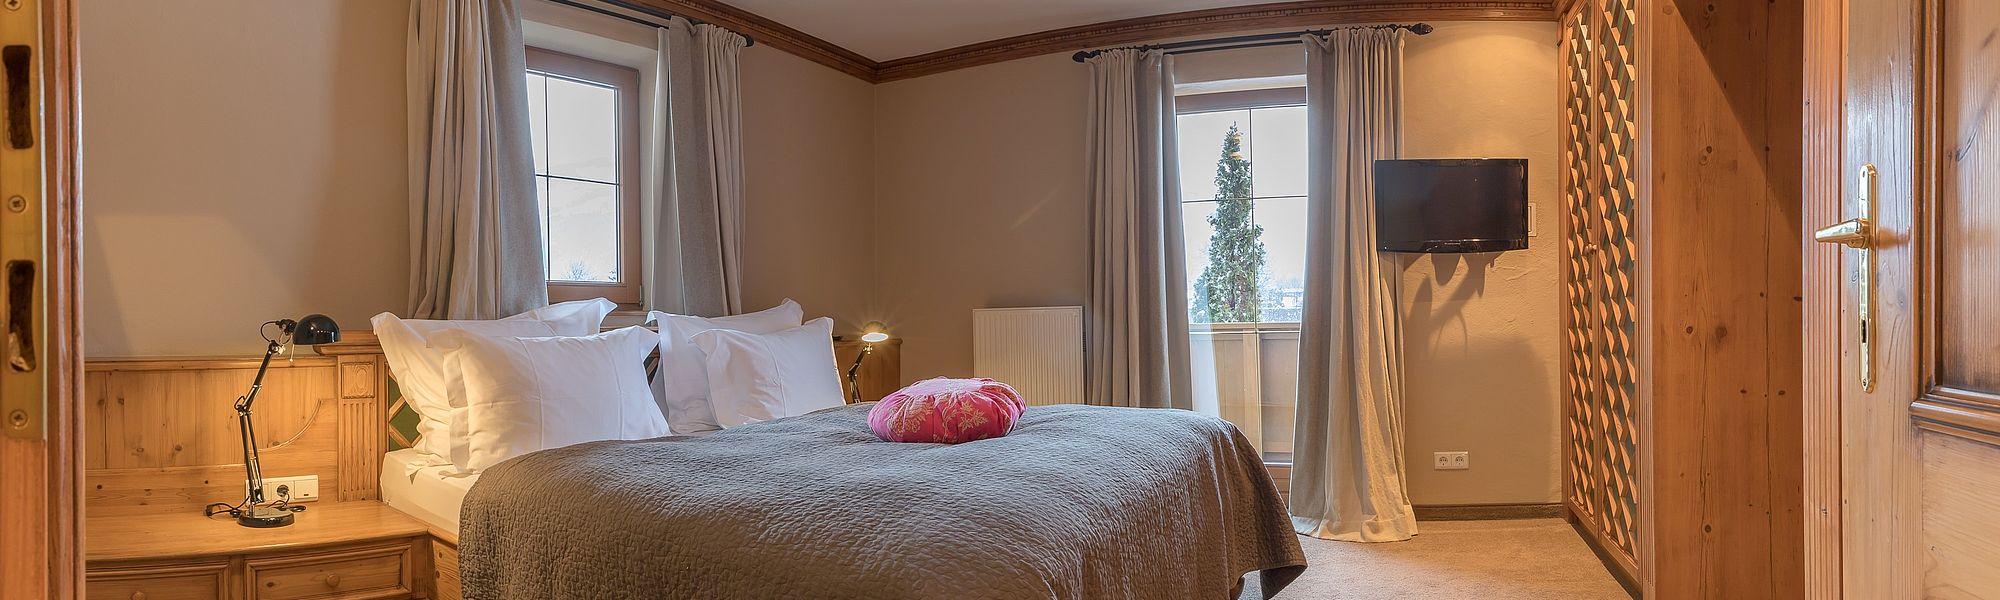 Zimmer RelaxSuite 203 im Apartment Haidacher